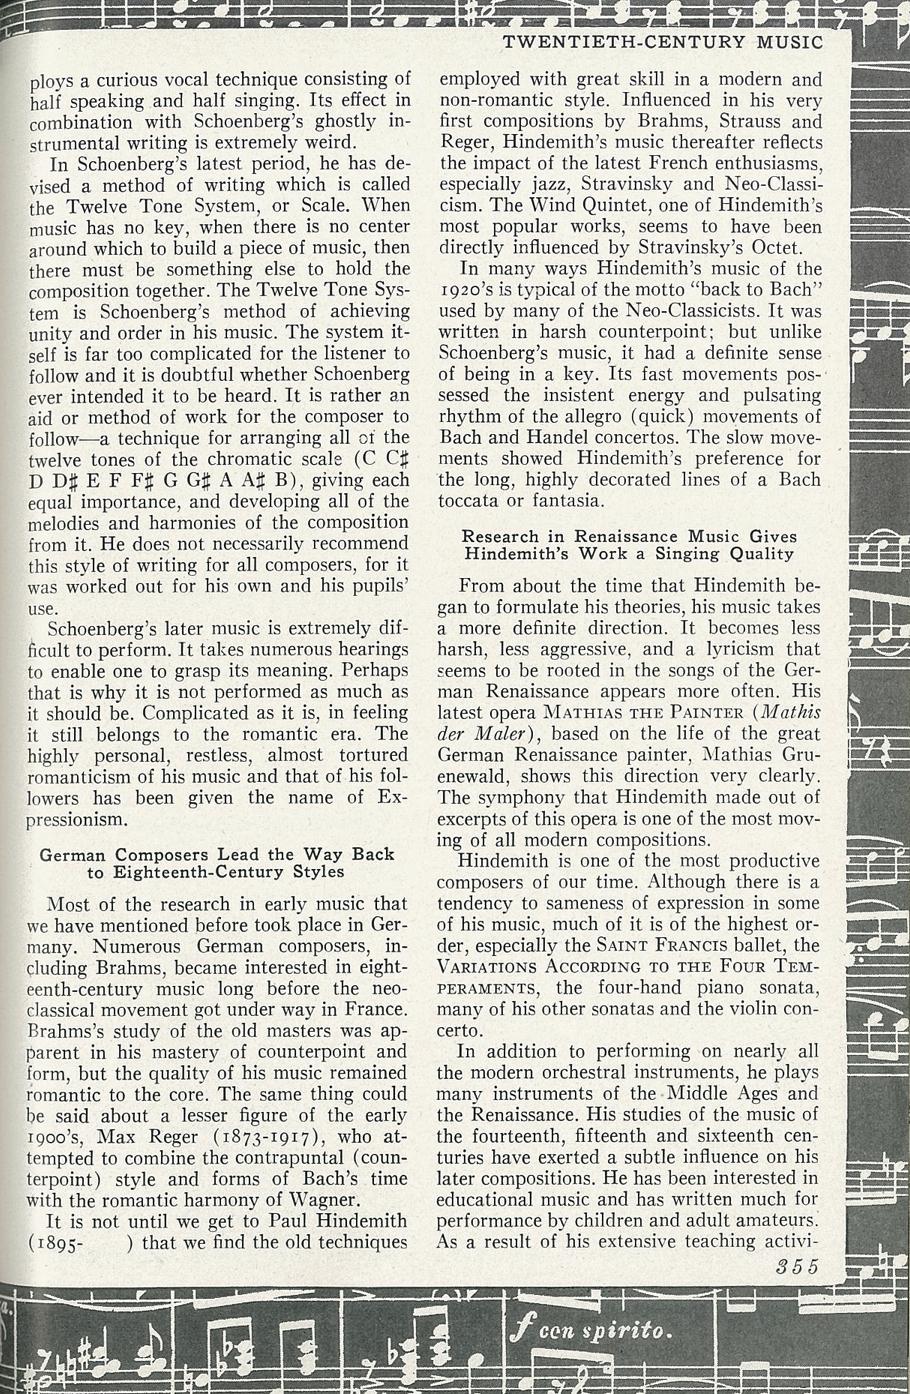 Fine Page 355